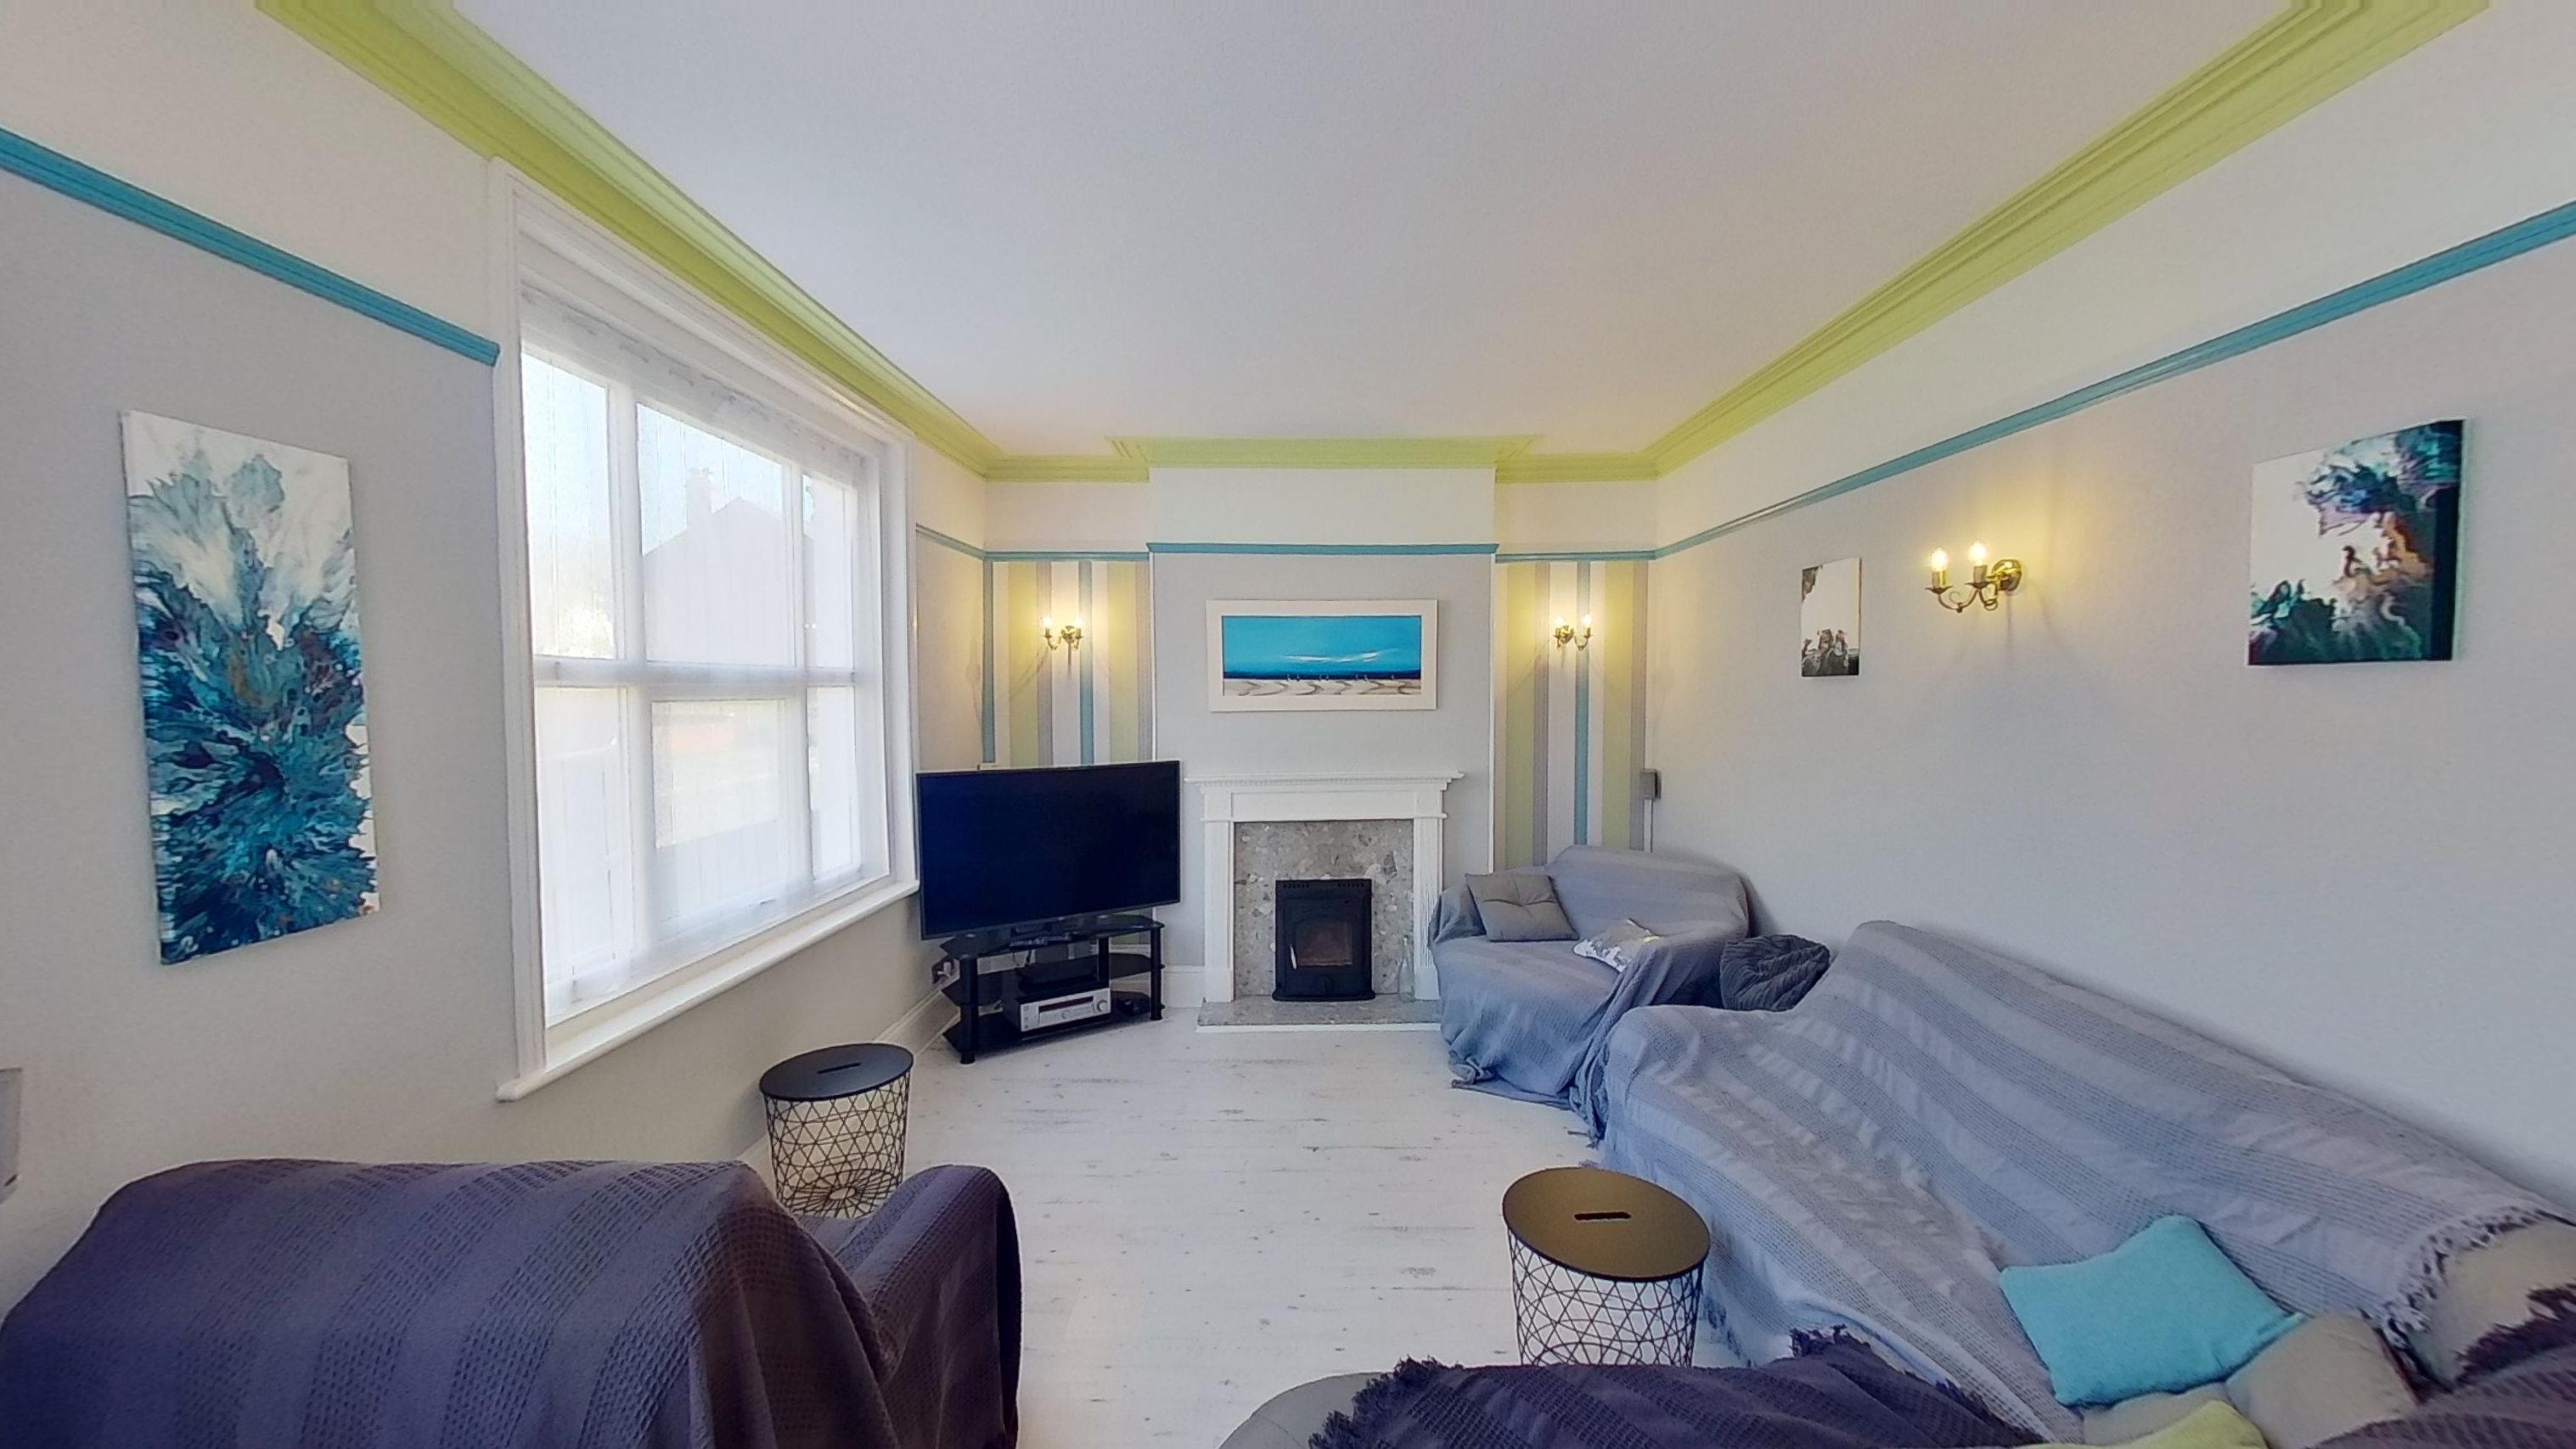 Beachcomber Holiday Lodge 07172021 195050